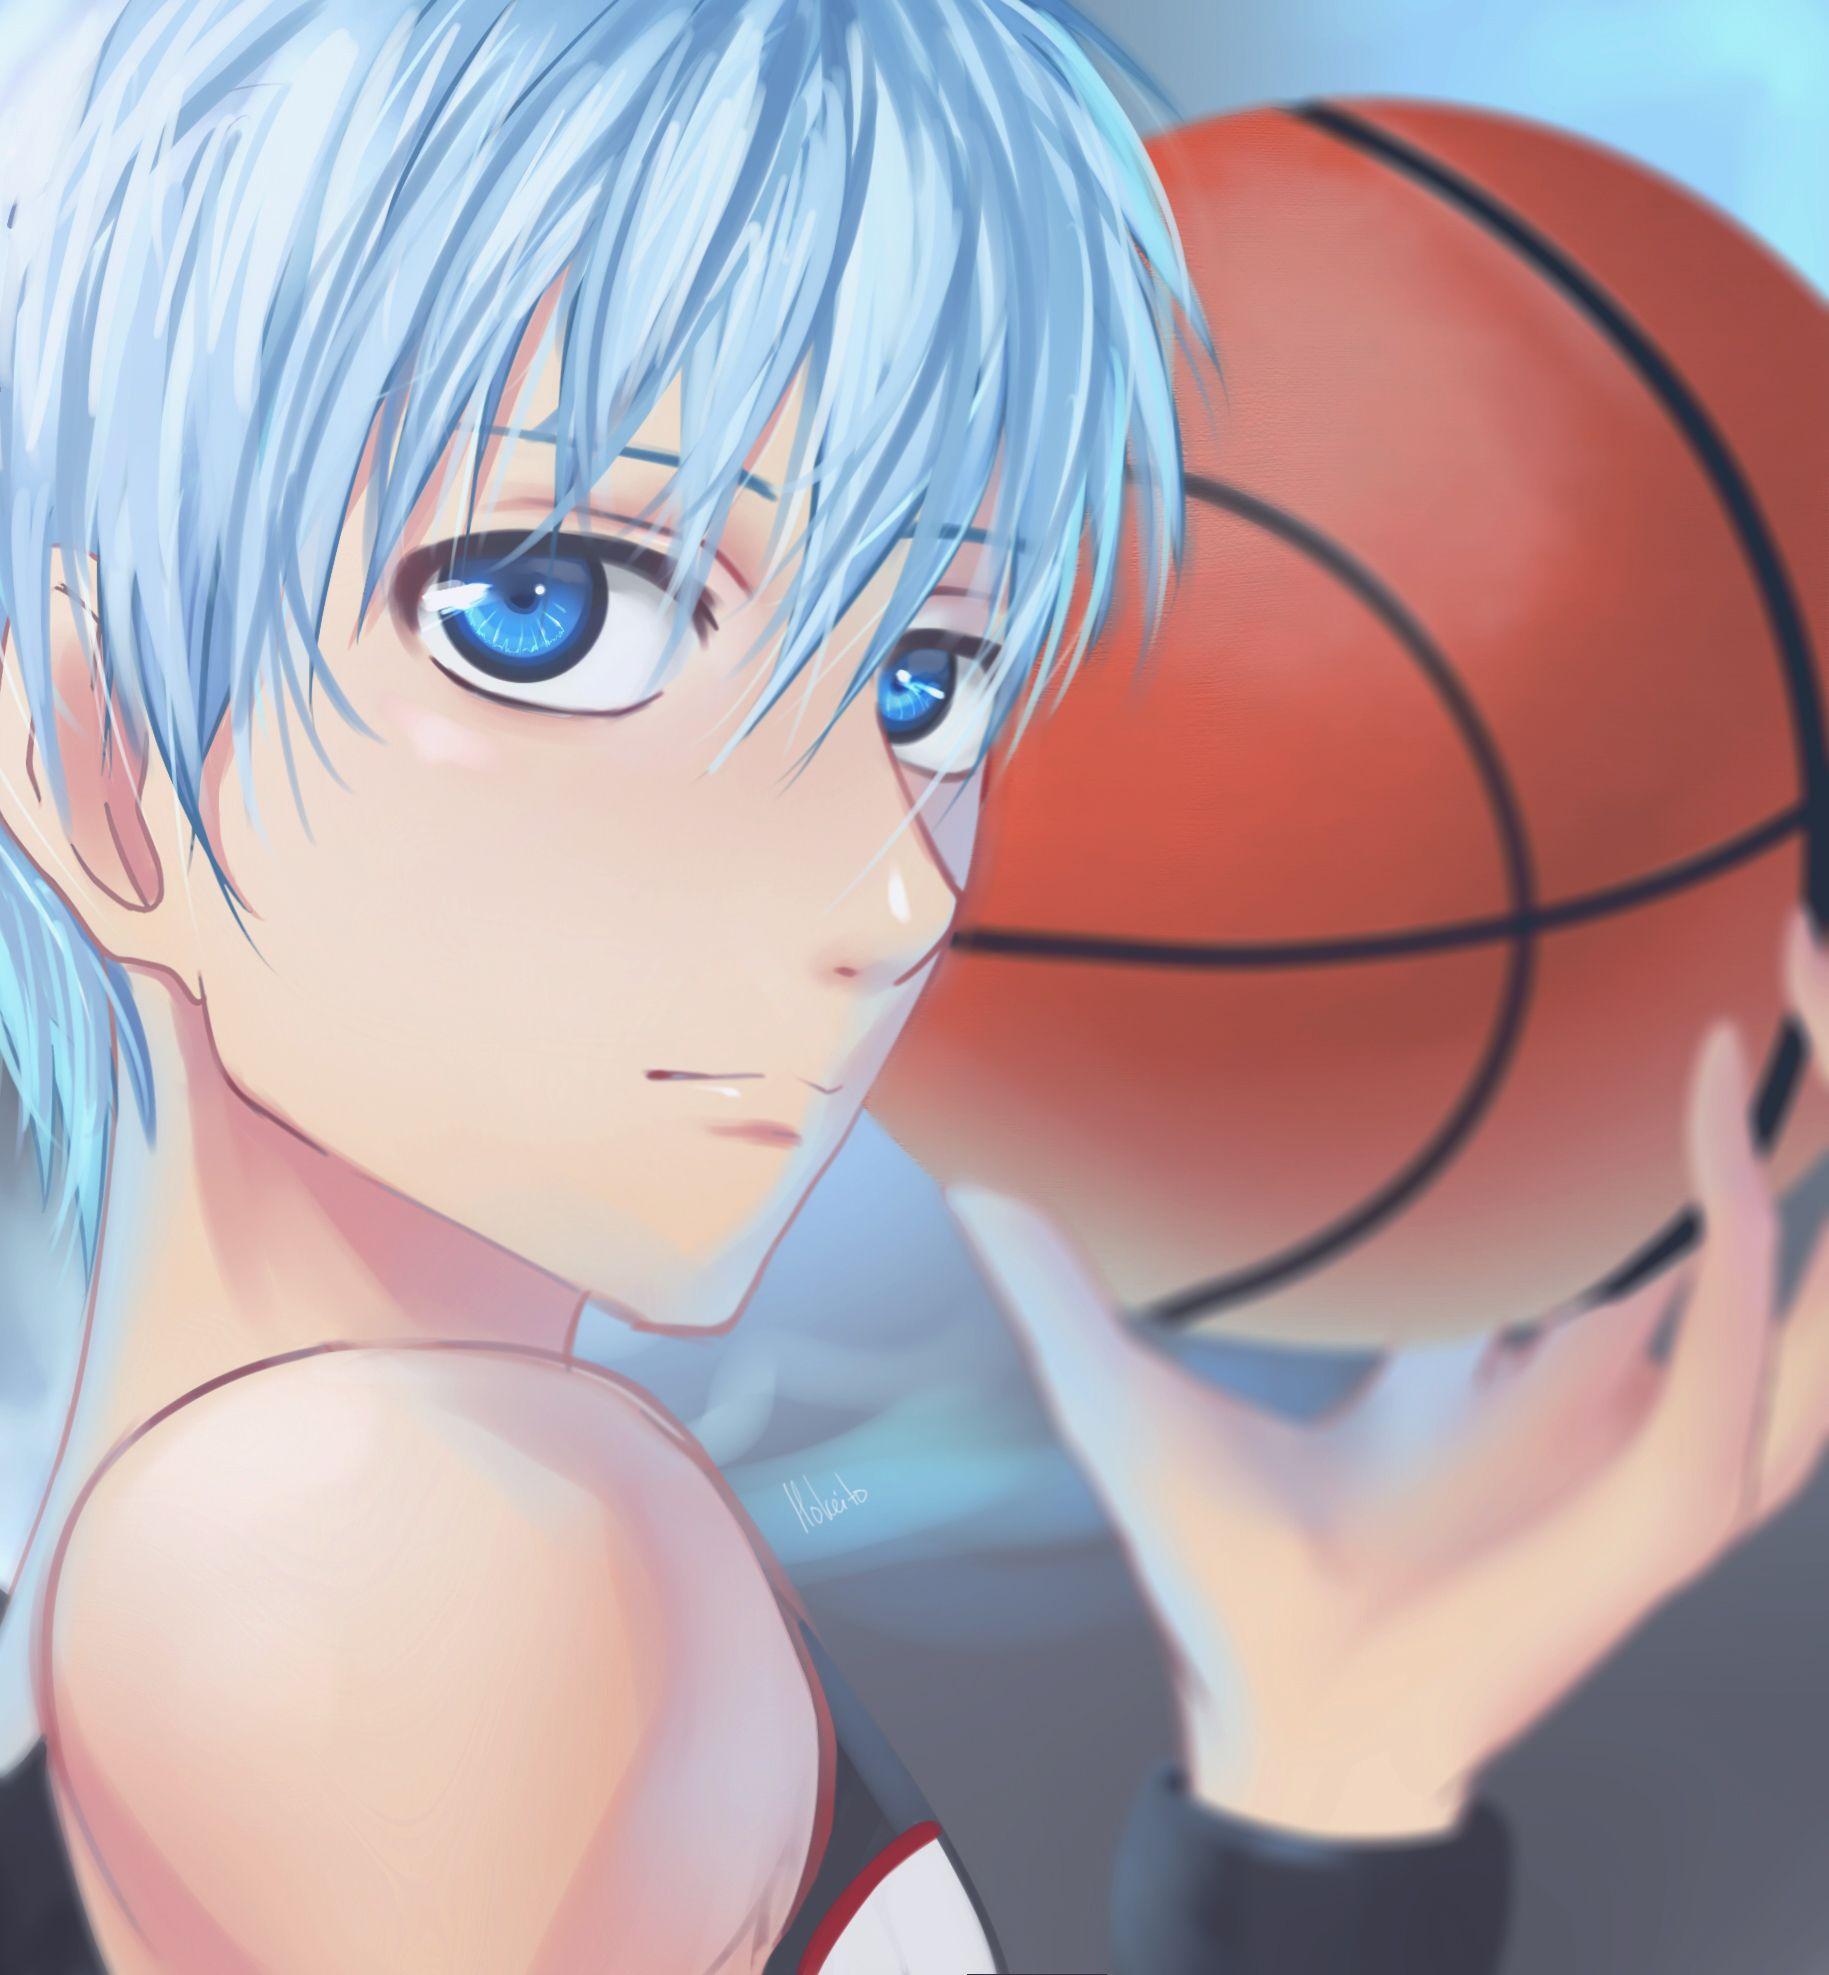 сознается, что баскетбол куроко крутые картинки ватник